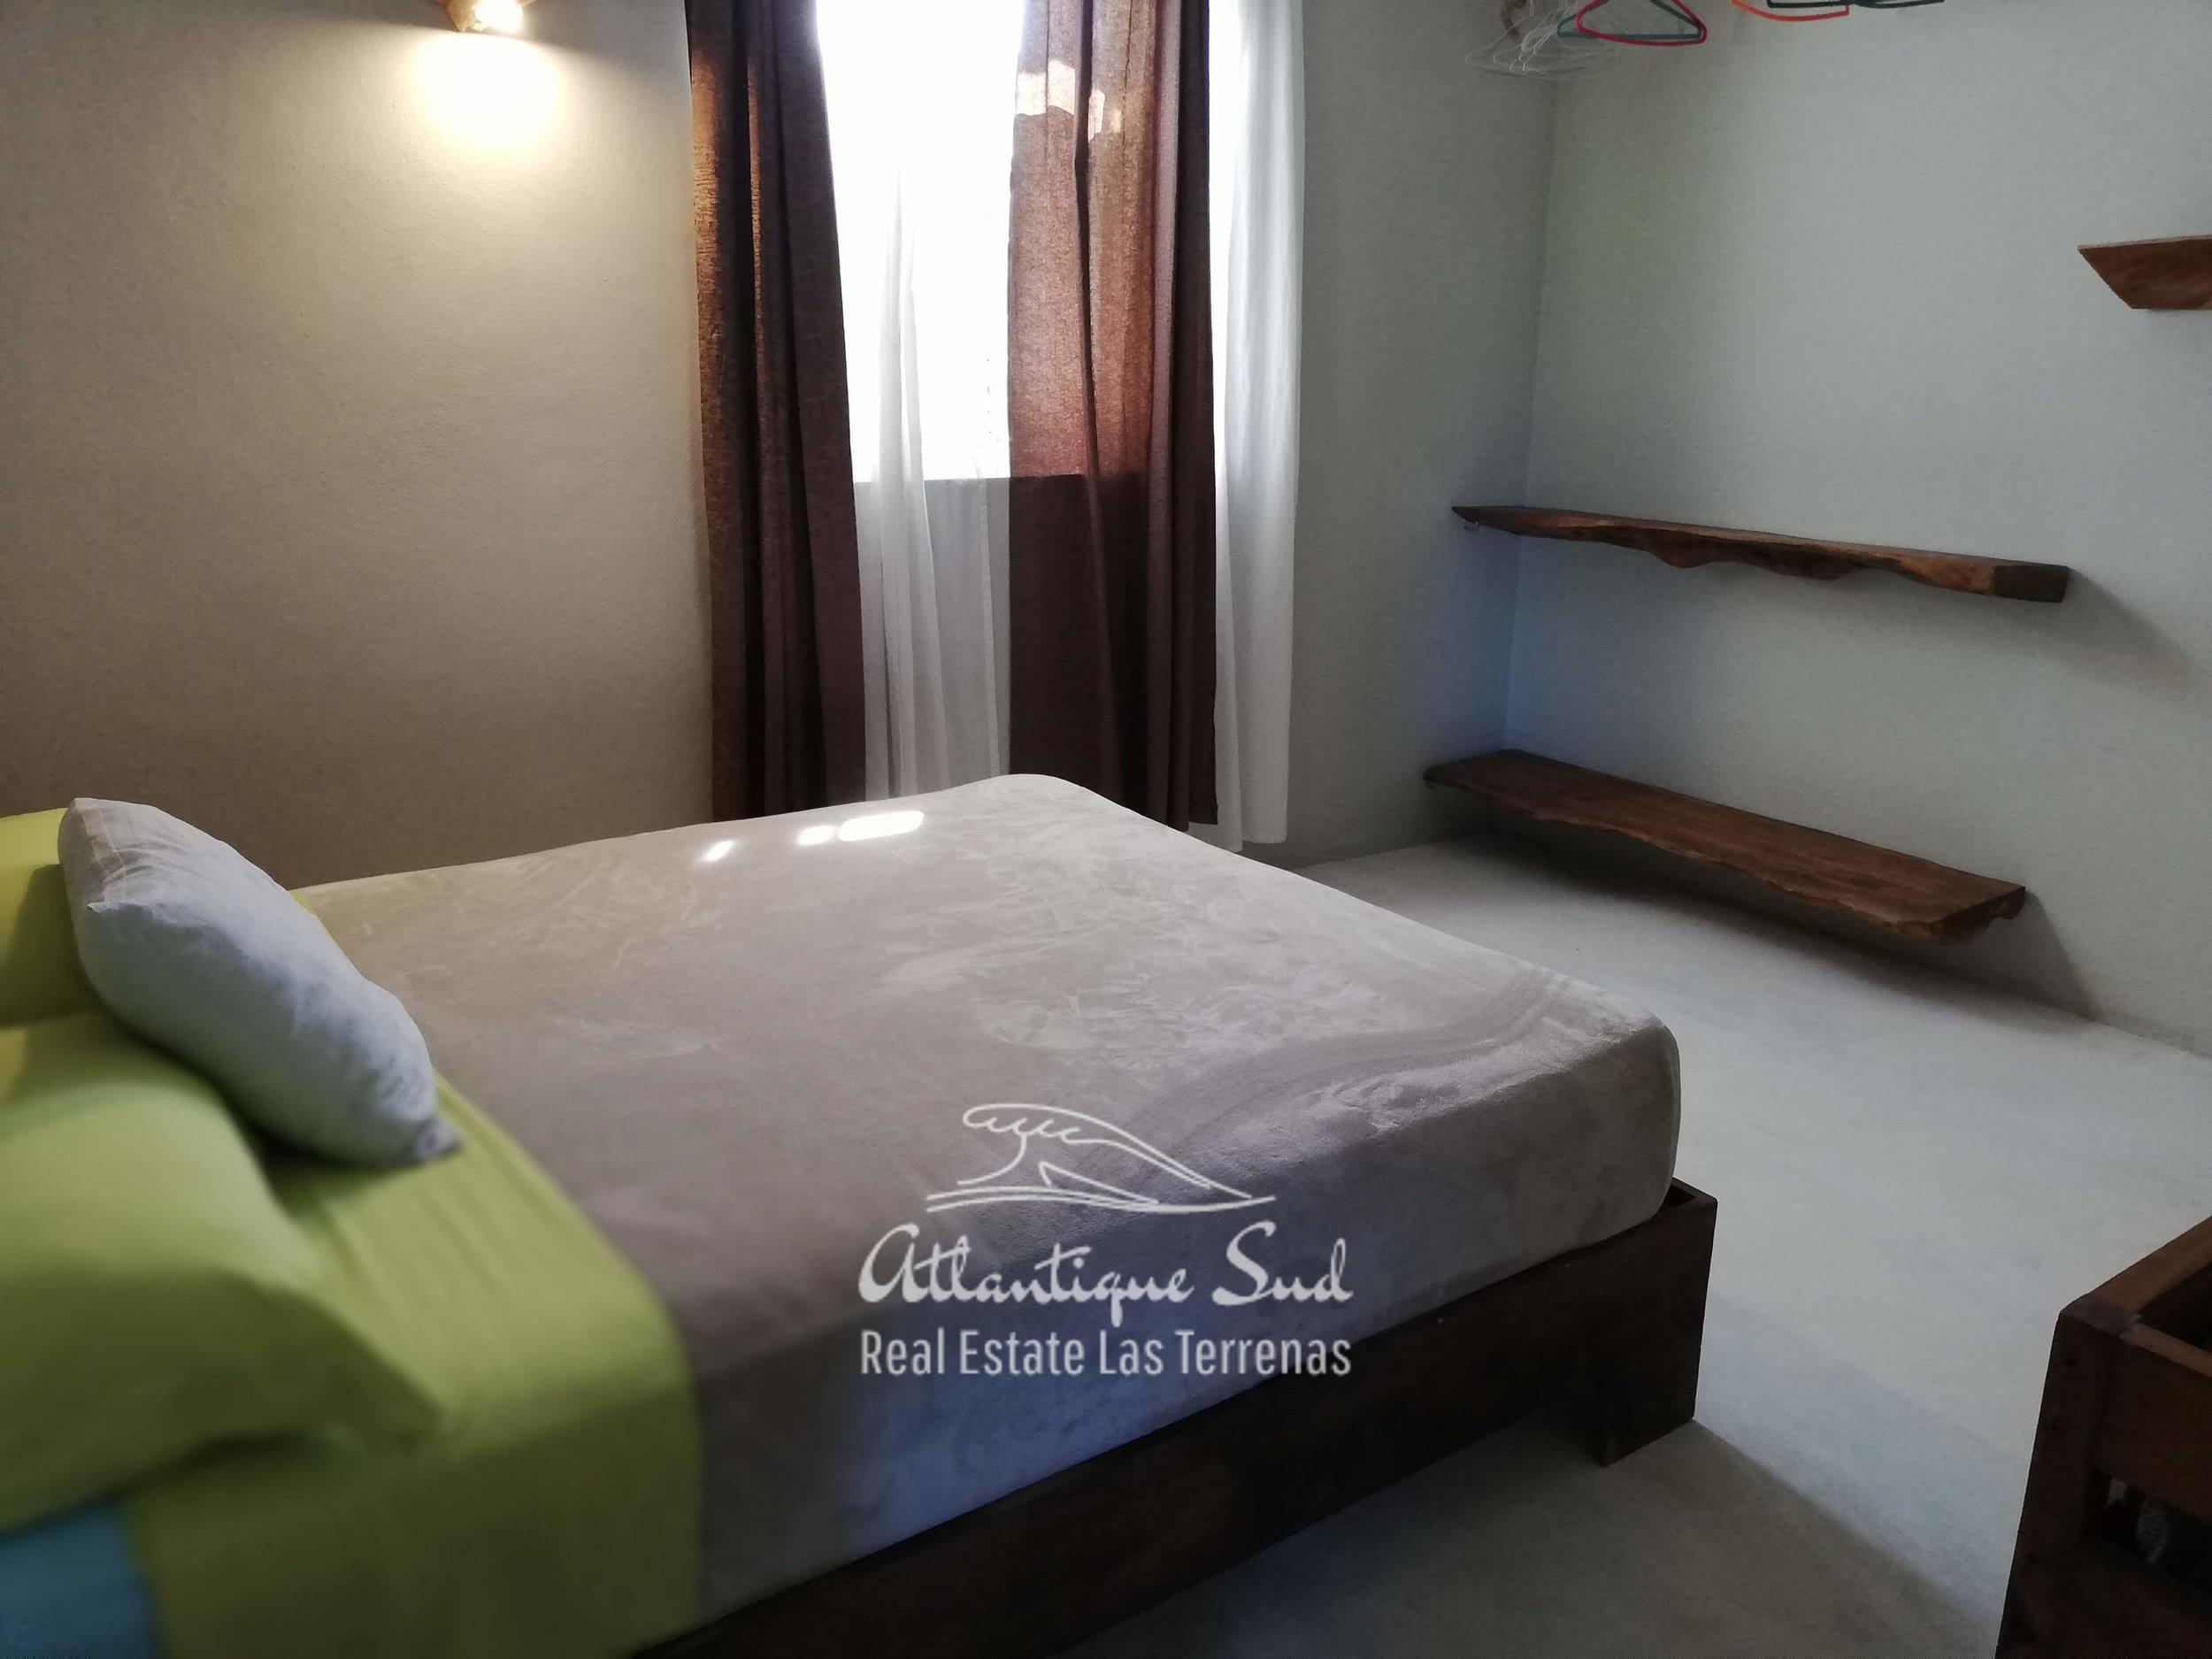 Typical caribbean hotel for sale Real Estate Las Terrenas Dominican Republic Atlantique Sud26.jpg